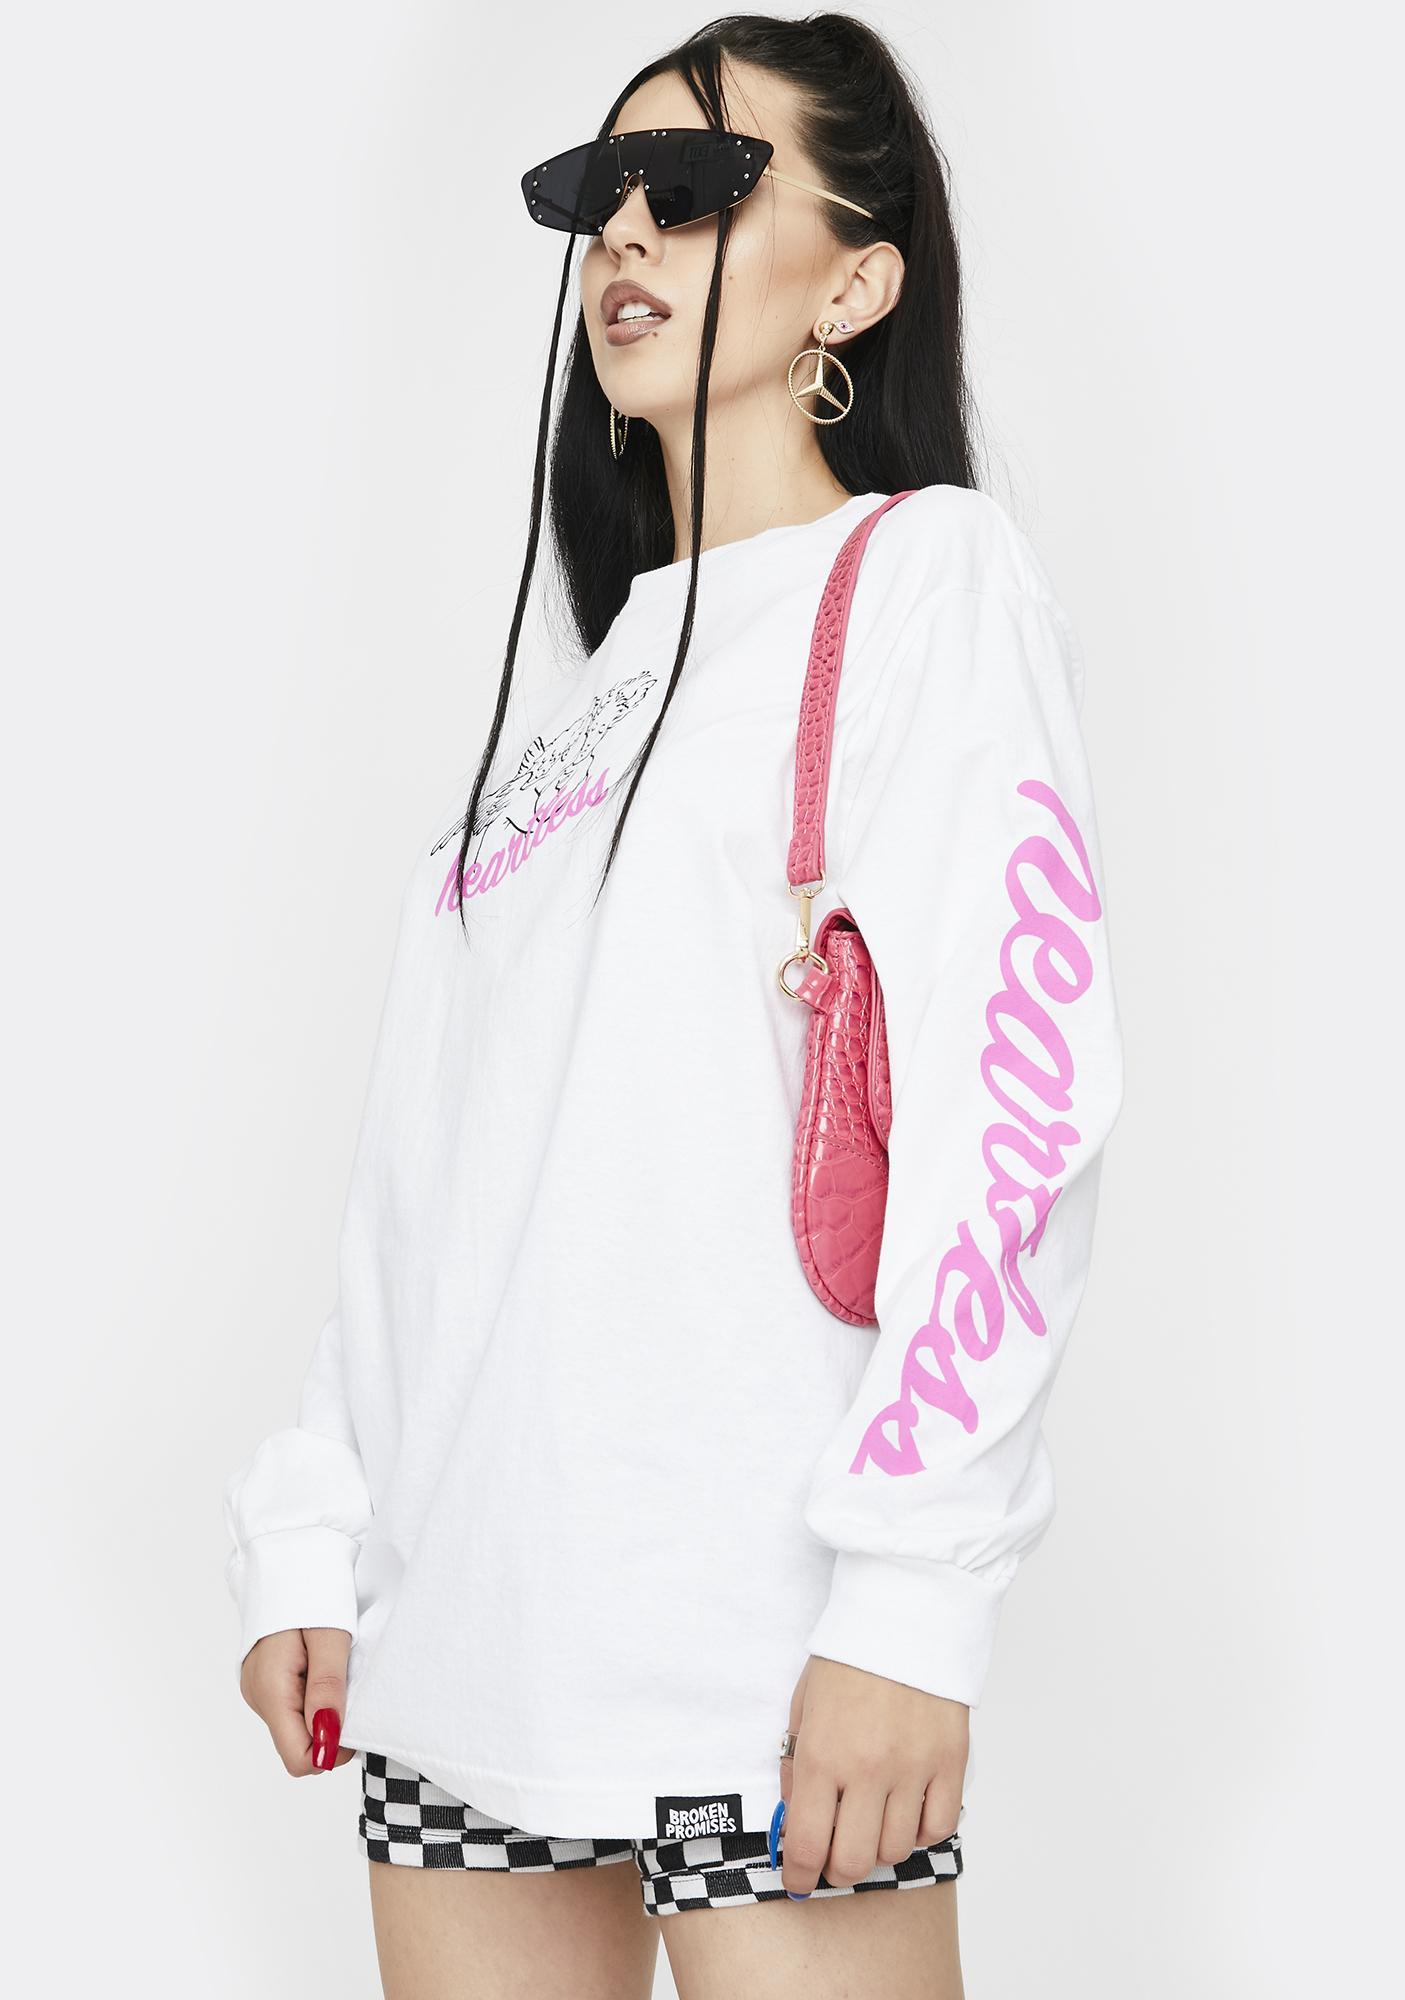 BROKEN PROMISES CO Pink Heartless Long Sleeve Graphic Tee